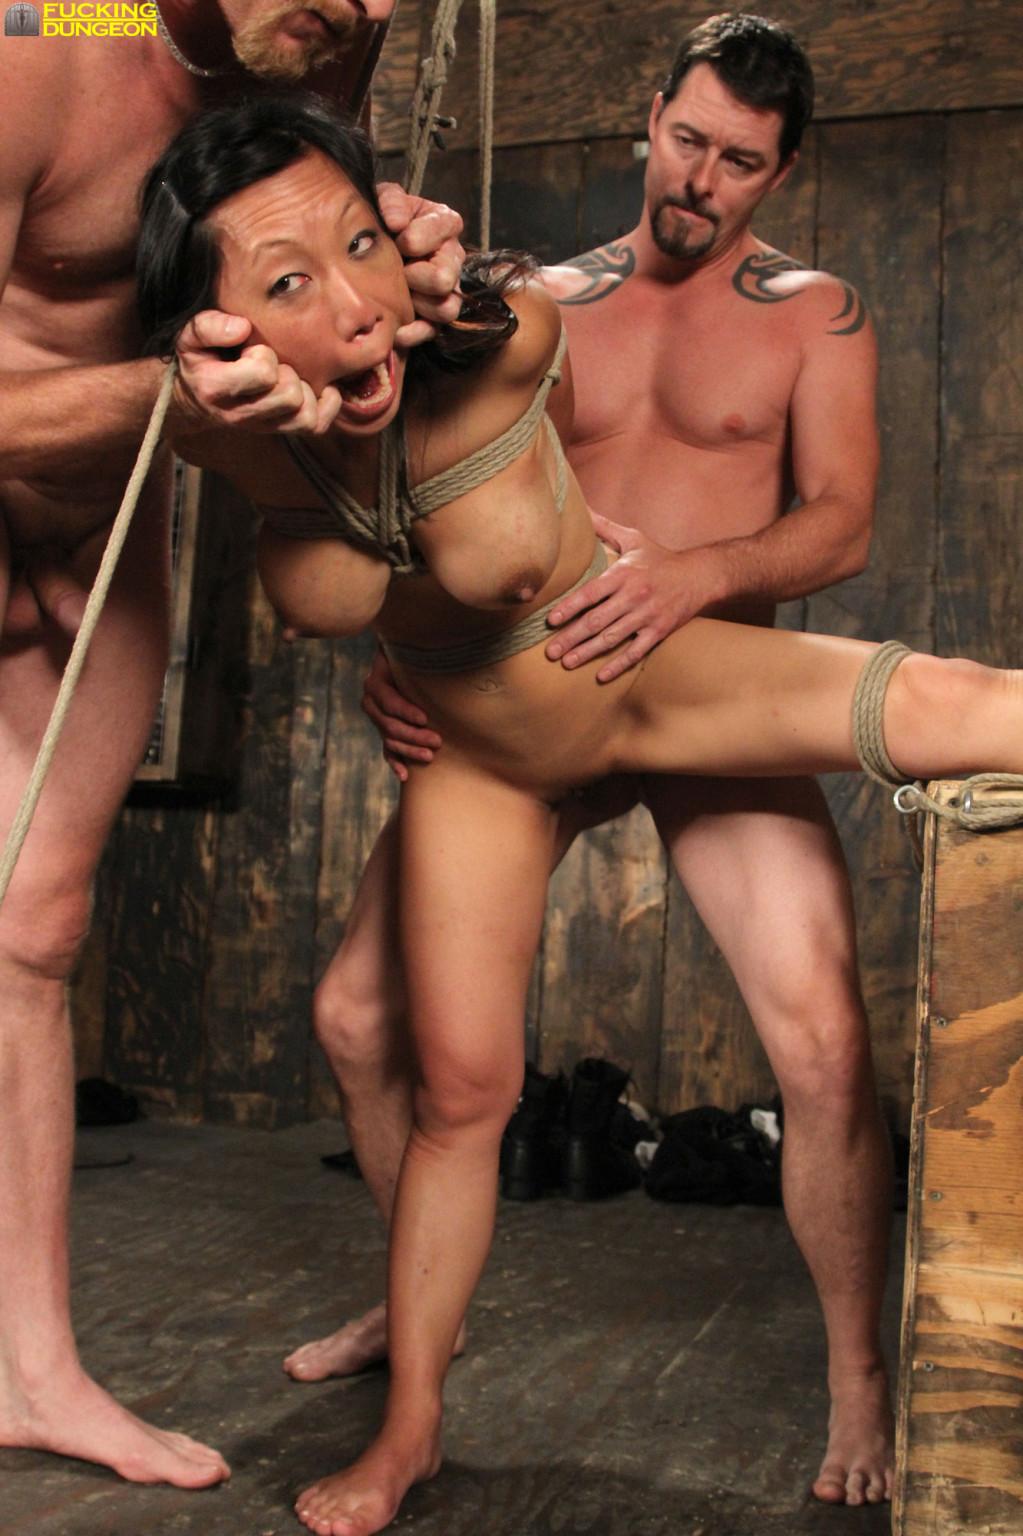 can help caption bondage art shaved cross spread porn OR erotic words... super, remarkable